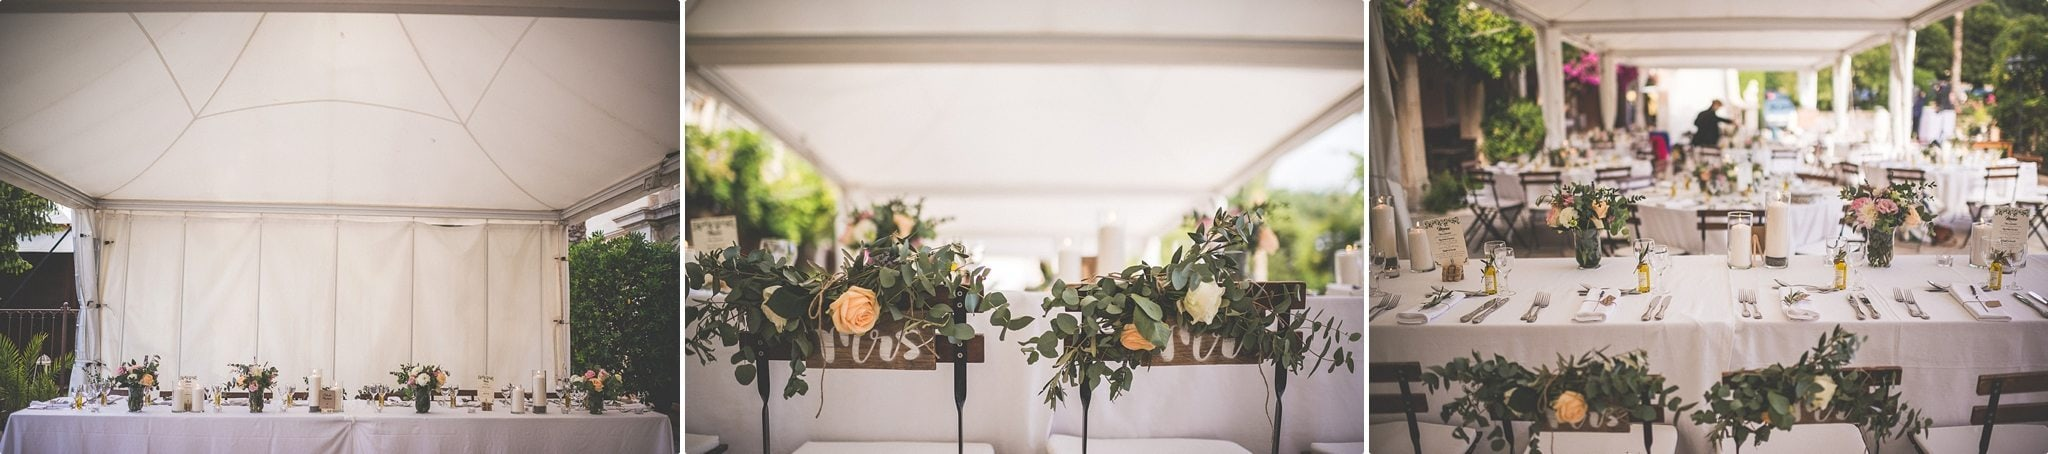 Domaine de la Croix - Wedding - Maria Assia Photography-311